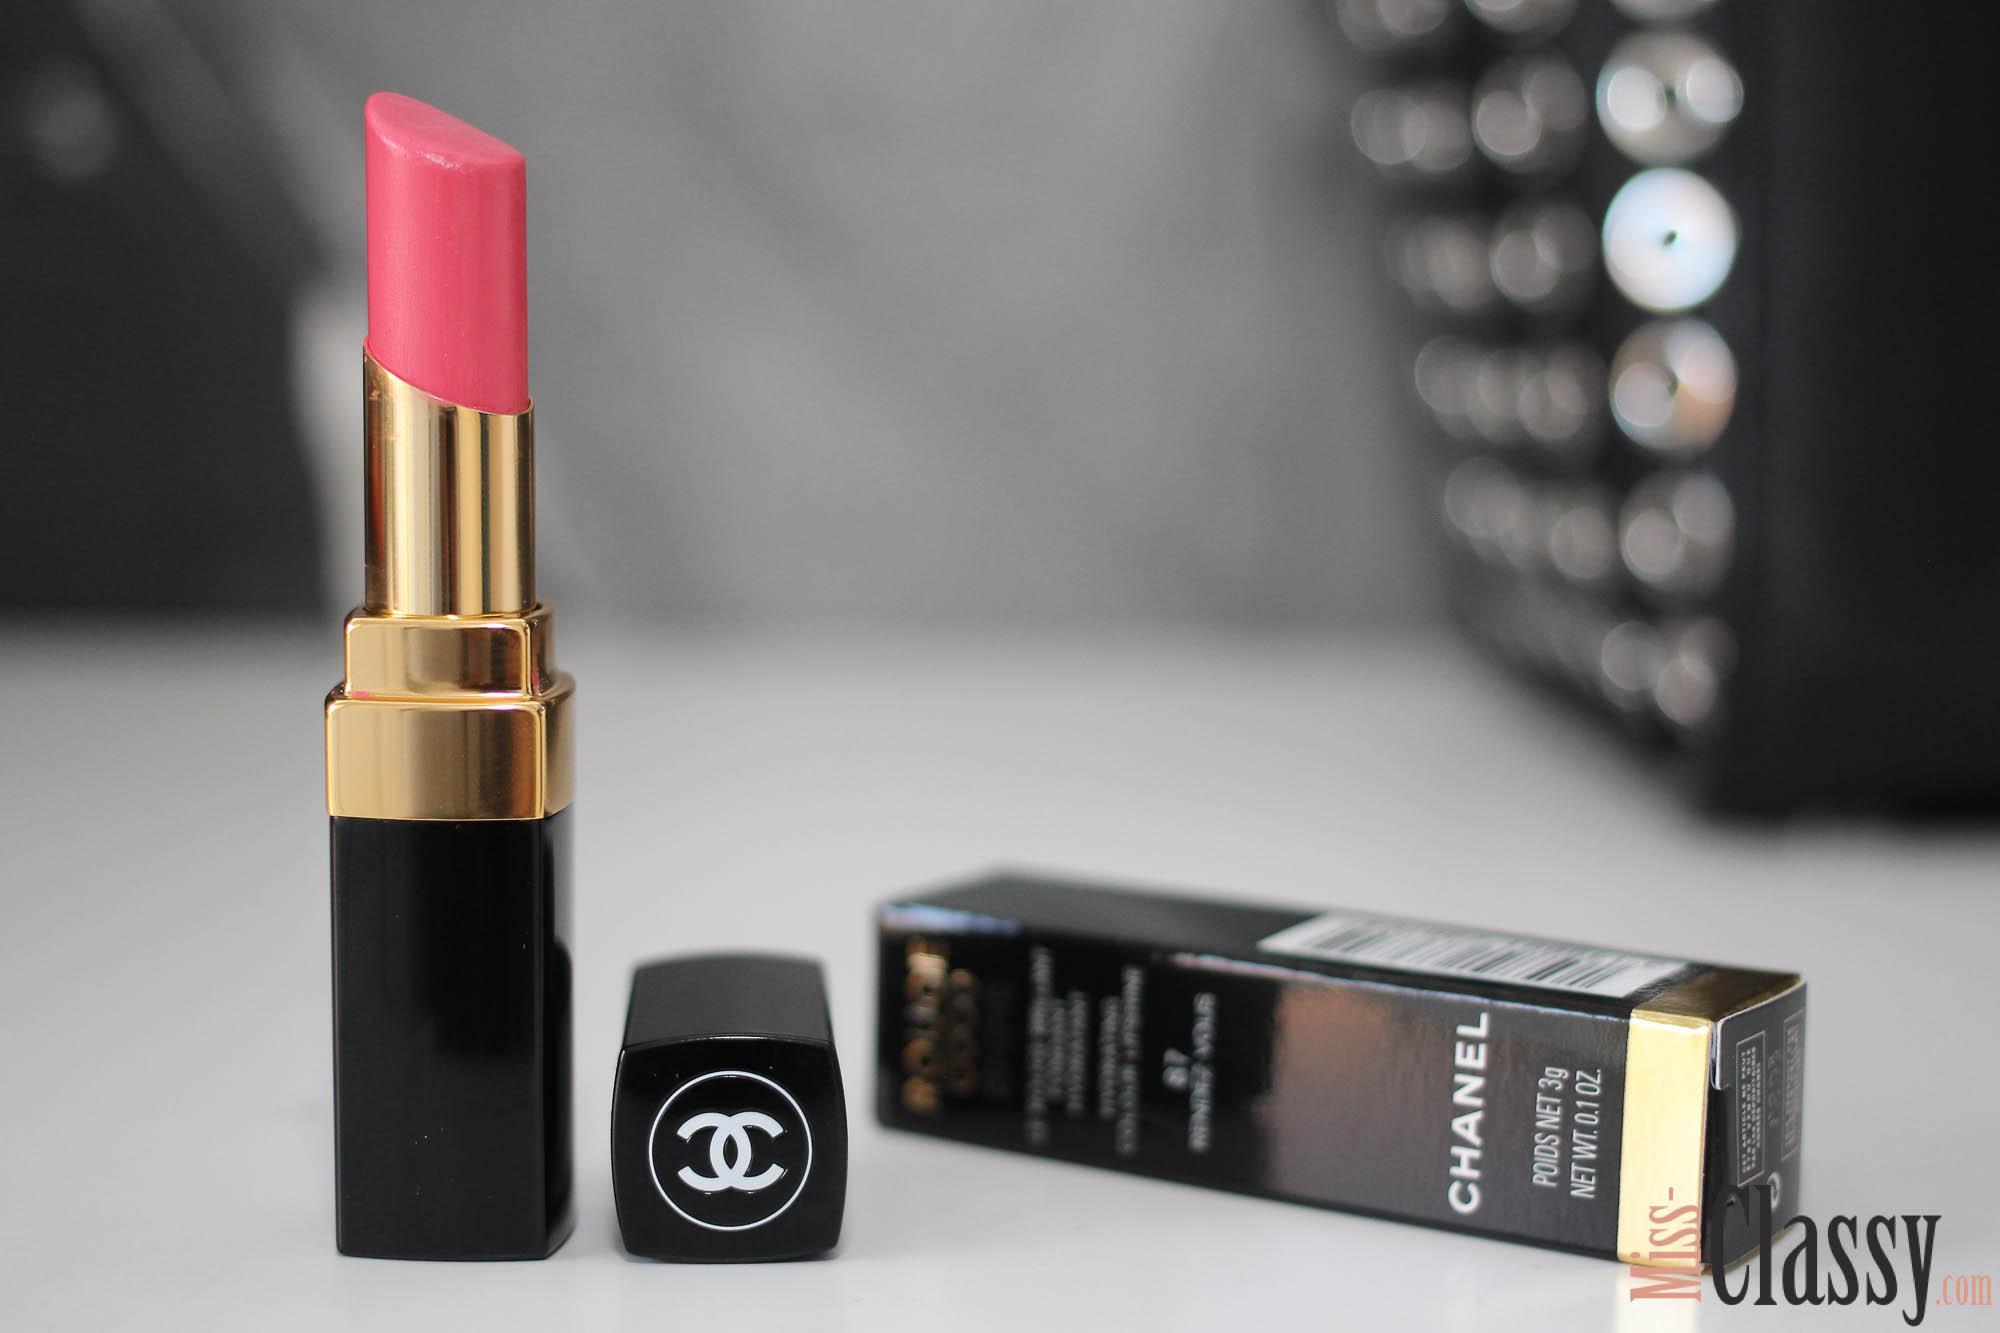 Chanel Rouge Coco Shine – Rendez-Vous - Luxus - Lippenstift, Kosmetik, Lipstick